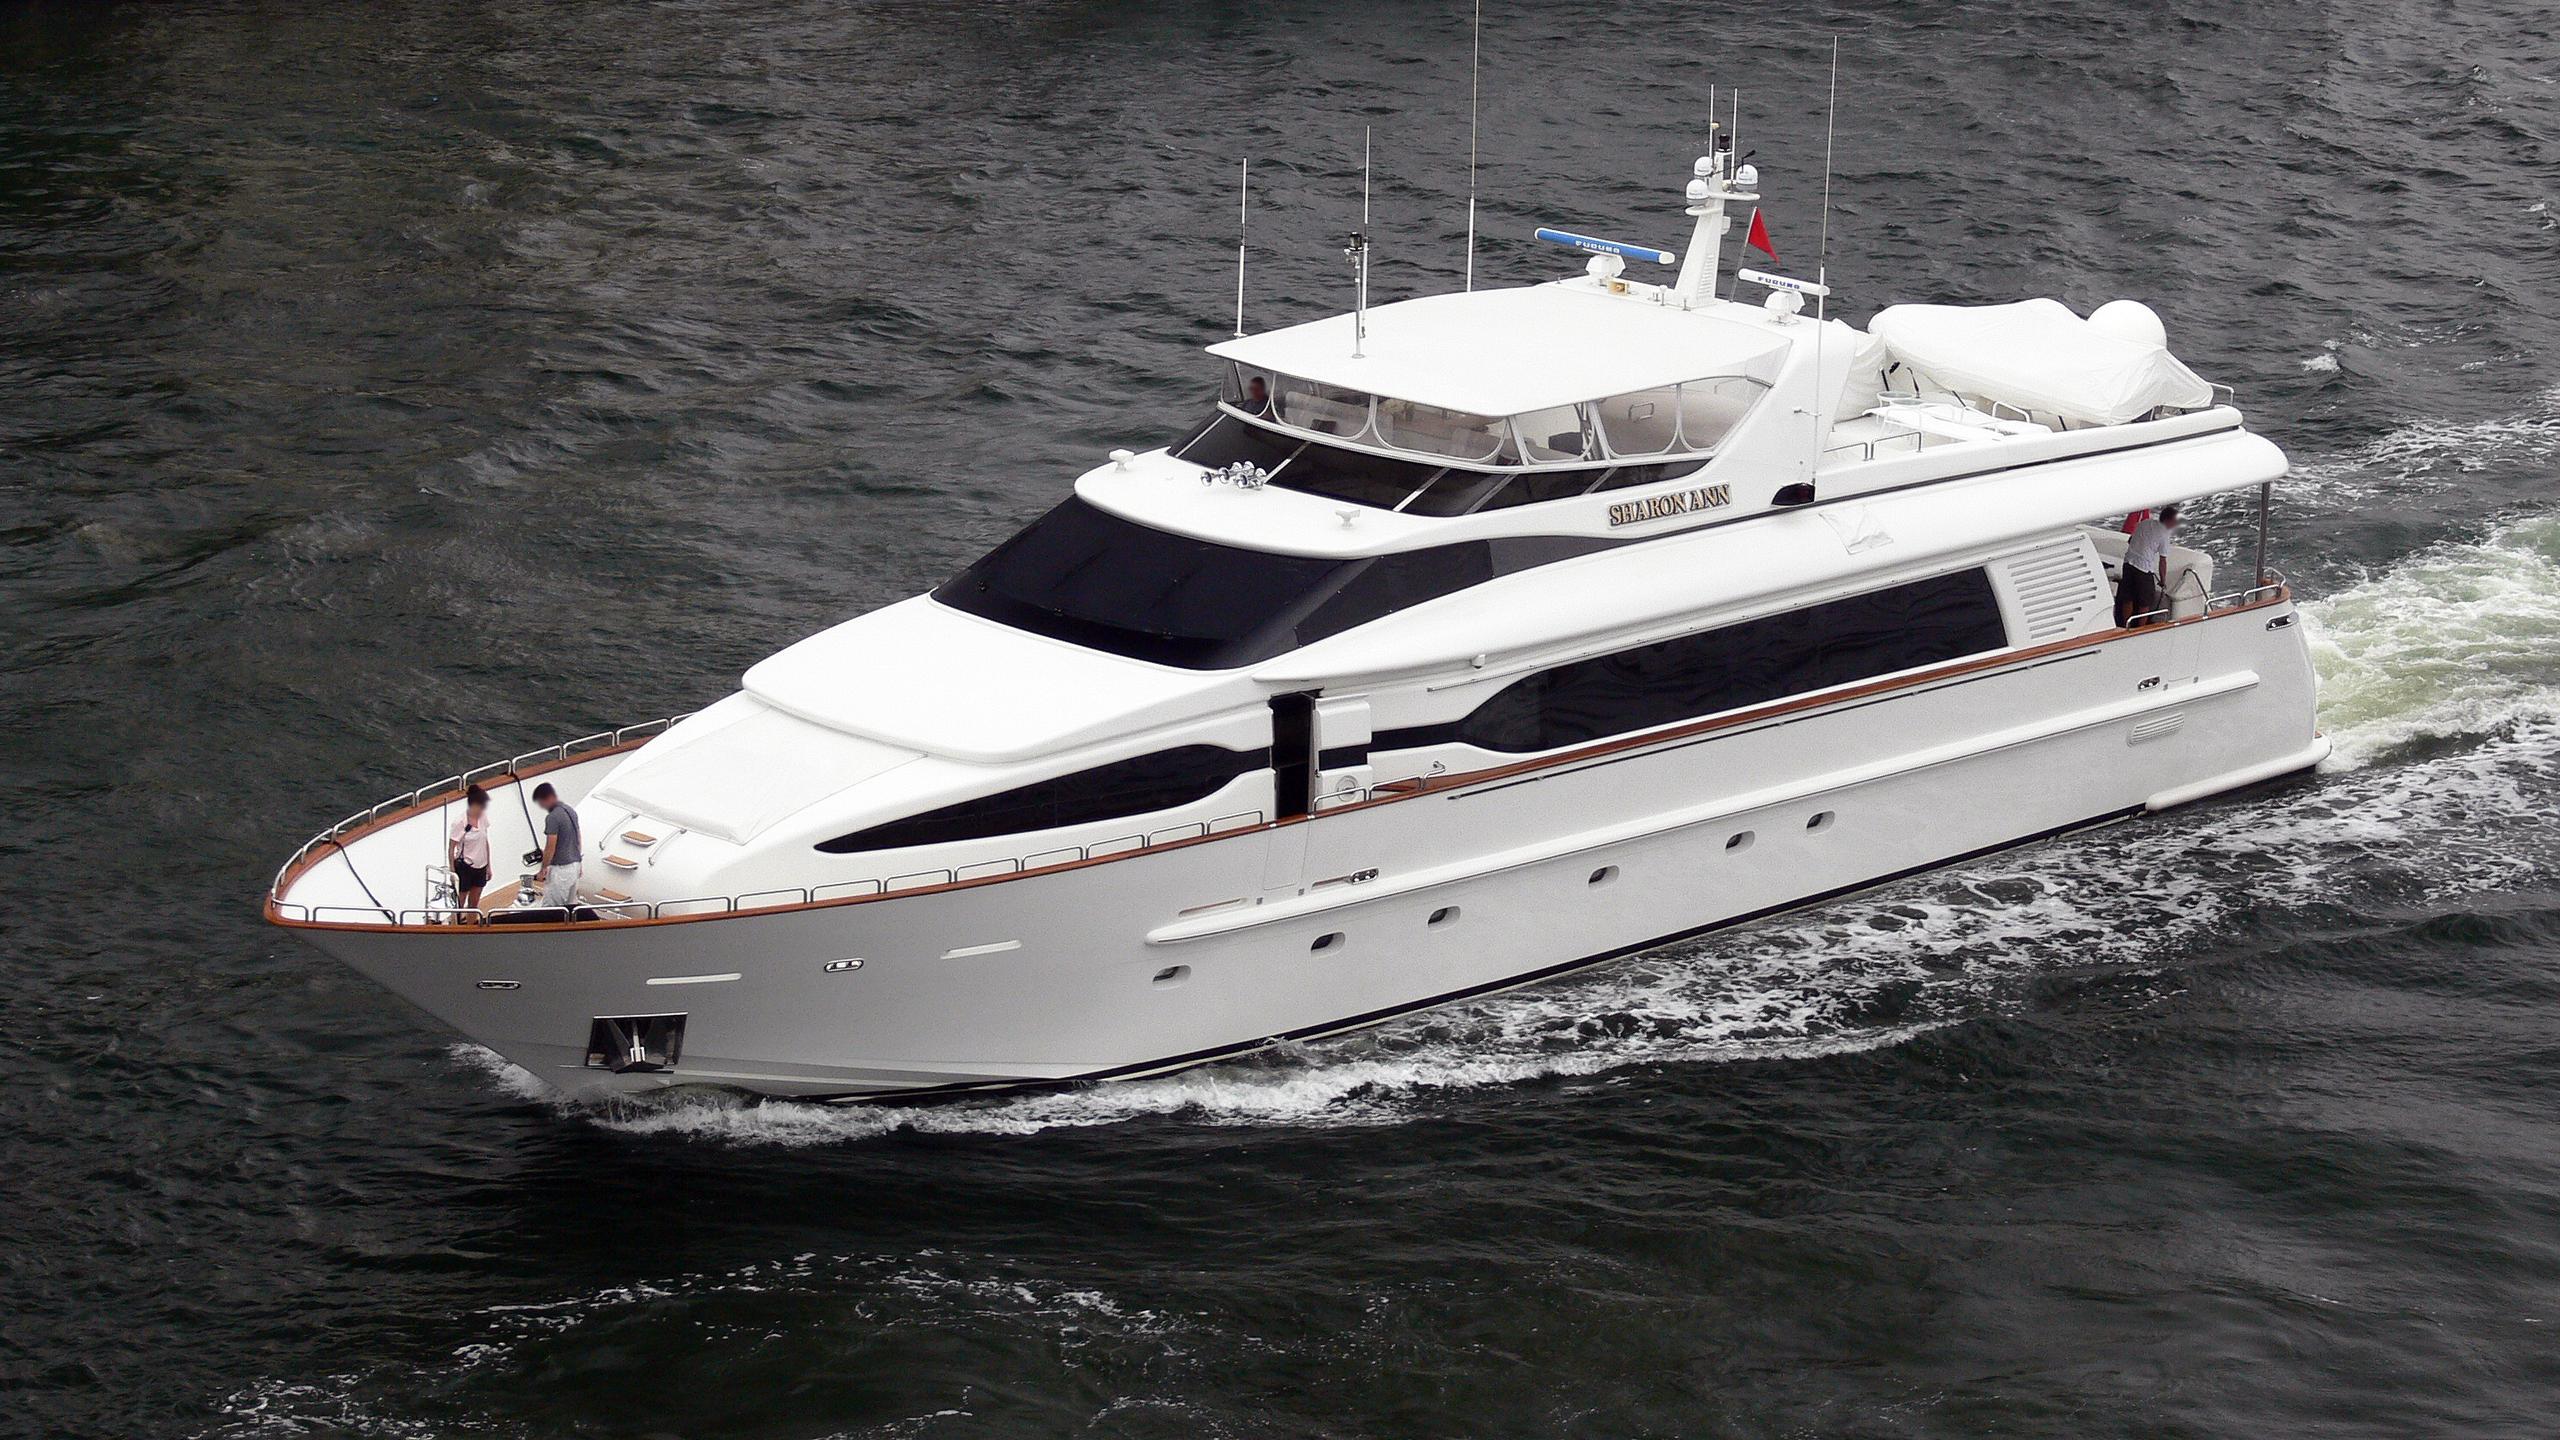 sharon-ann-motor-yacht-destiny-104-2002-32m-cruising